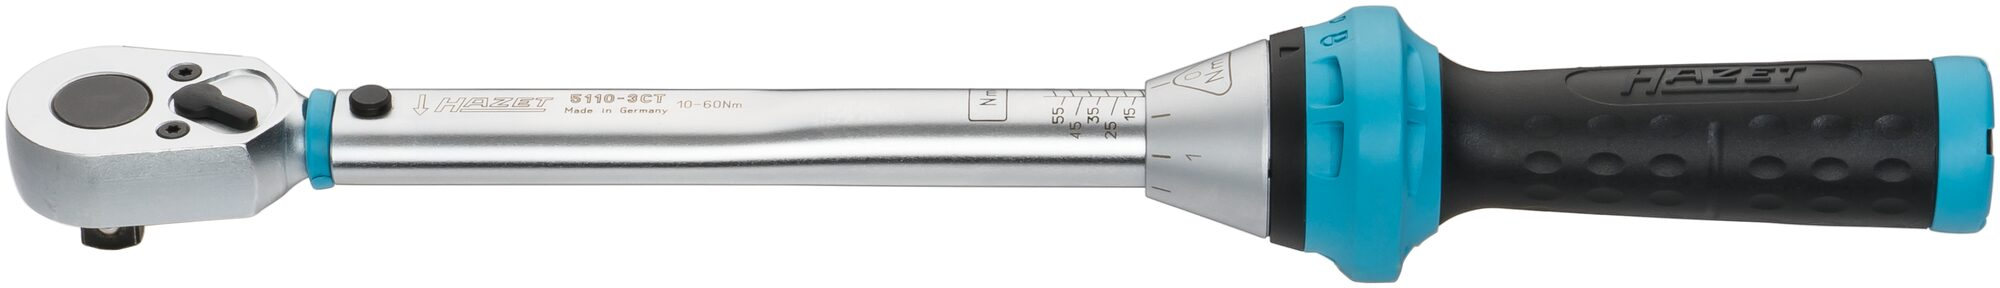 HAZET Drehmoment-Schlüssel 5110-3CT ∙ Nm min-max: 10–60 Nm ∙ Toleranz: 3% ∙ Vierkant massiv 10 mm (3/8 Zoll)